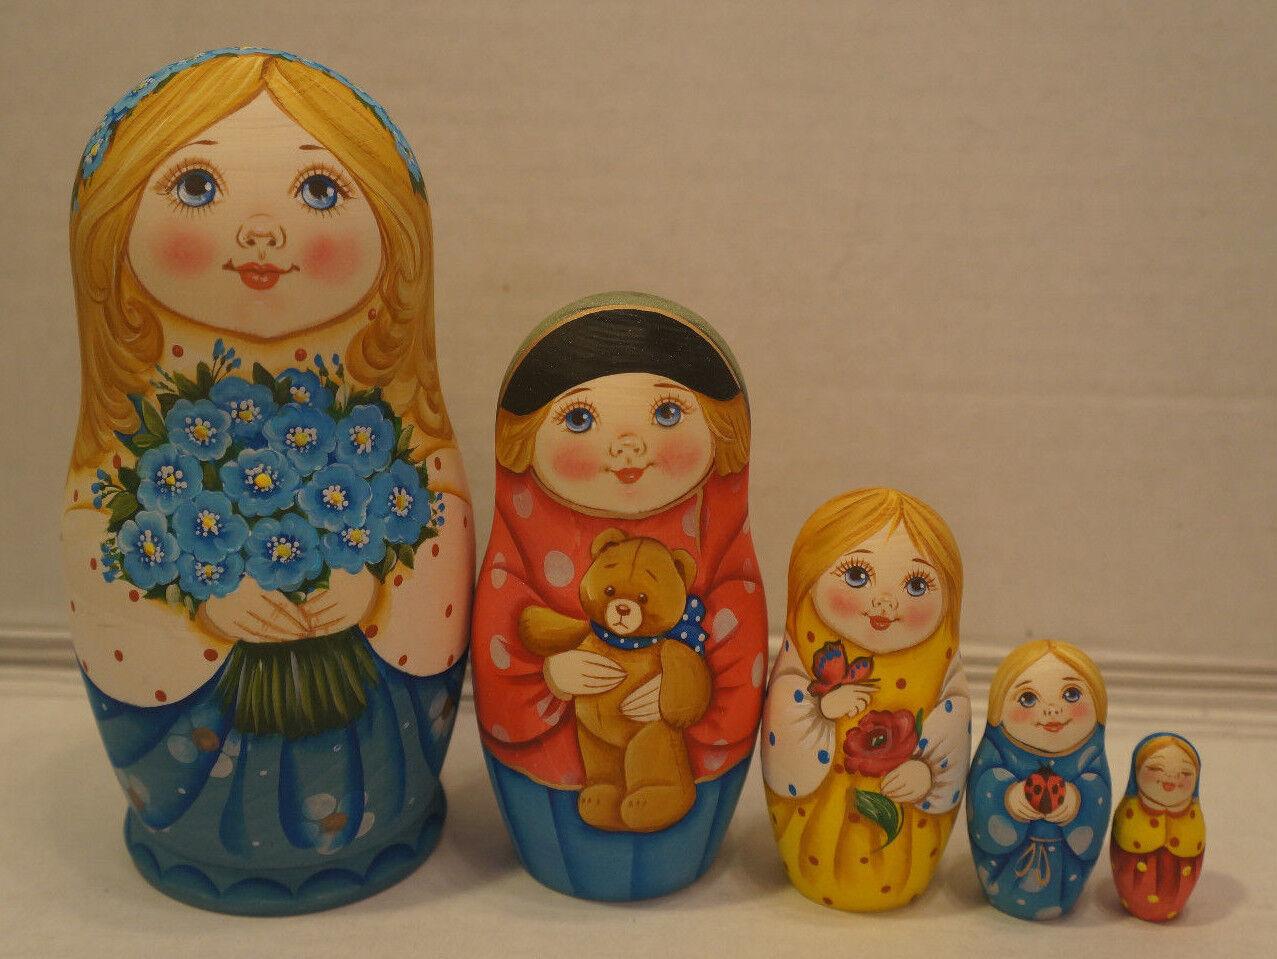 Russian Matryoshka - Wooden Nesting Dolls - 5 Pieces Unique Coloreeing - Set  9